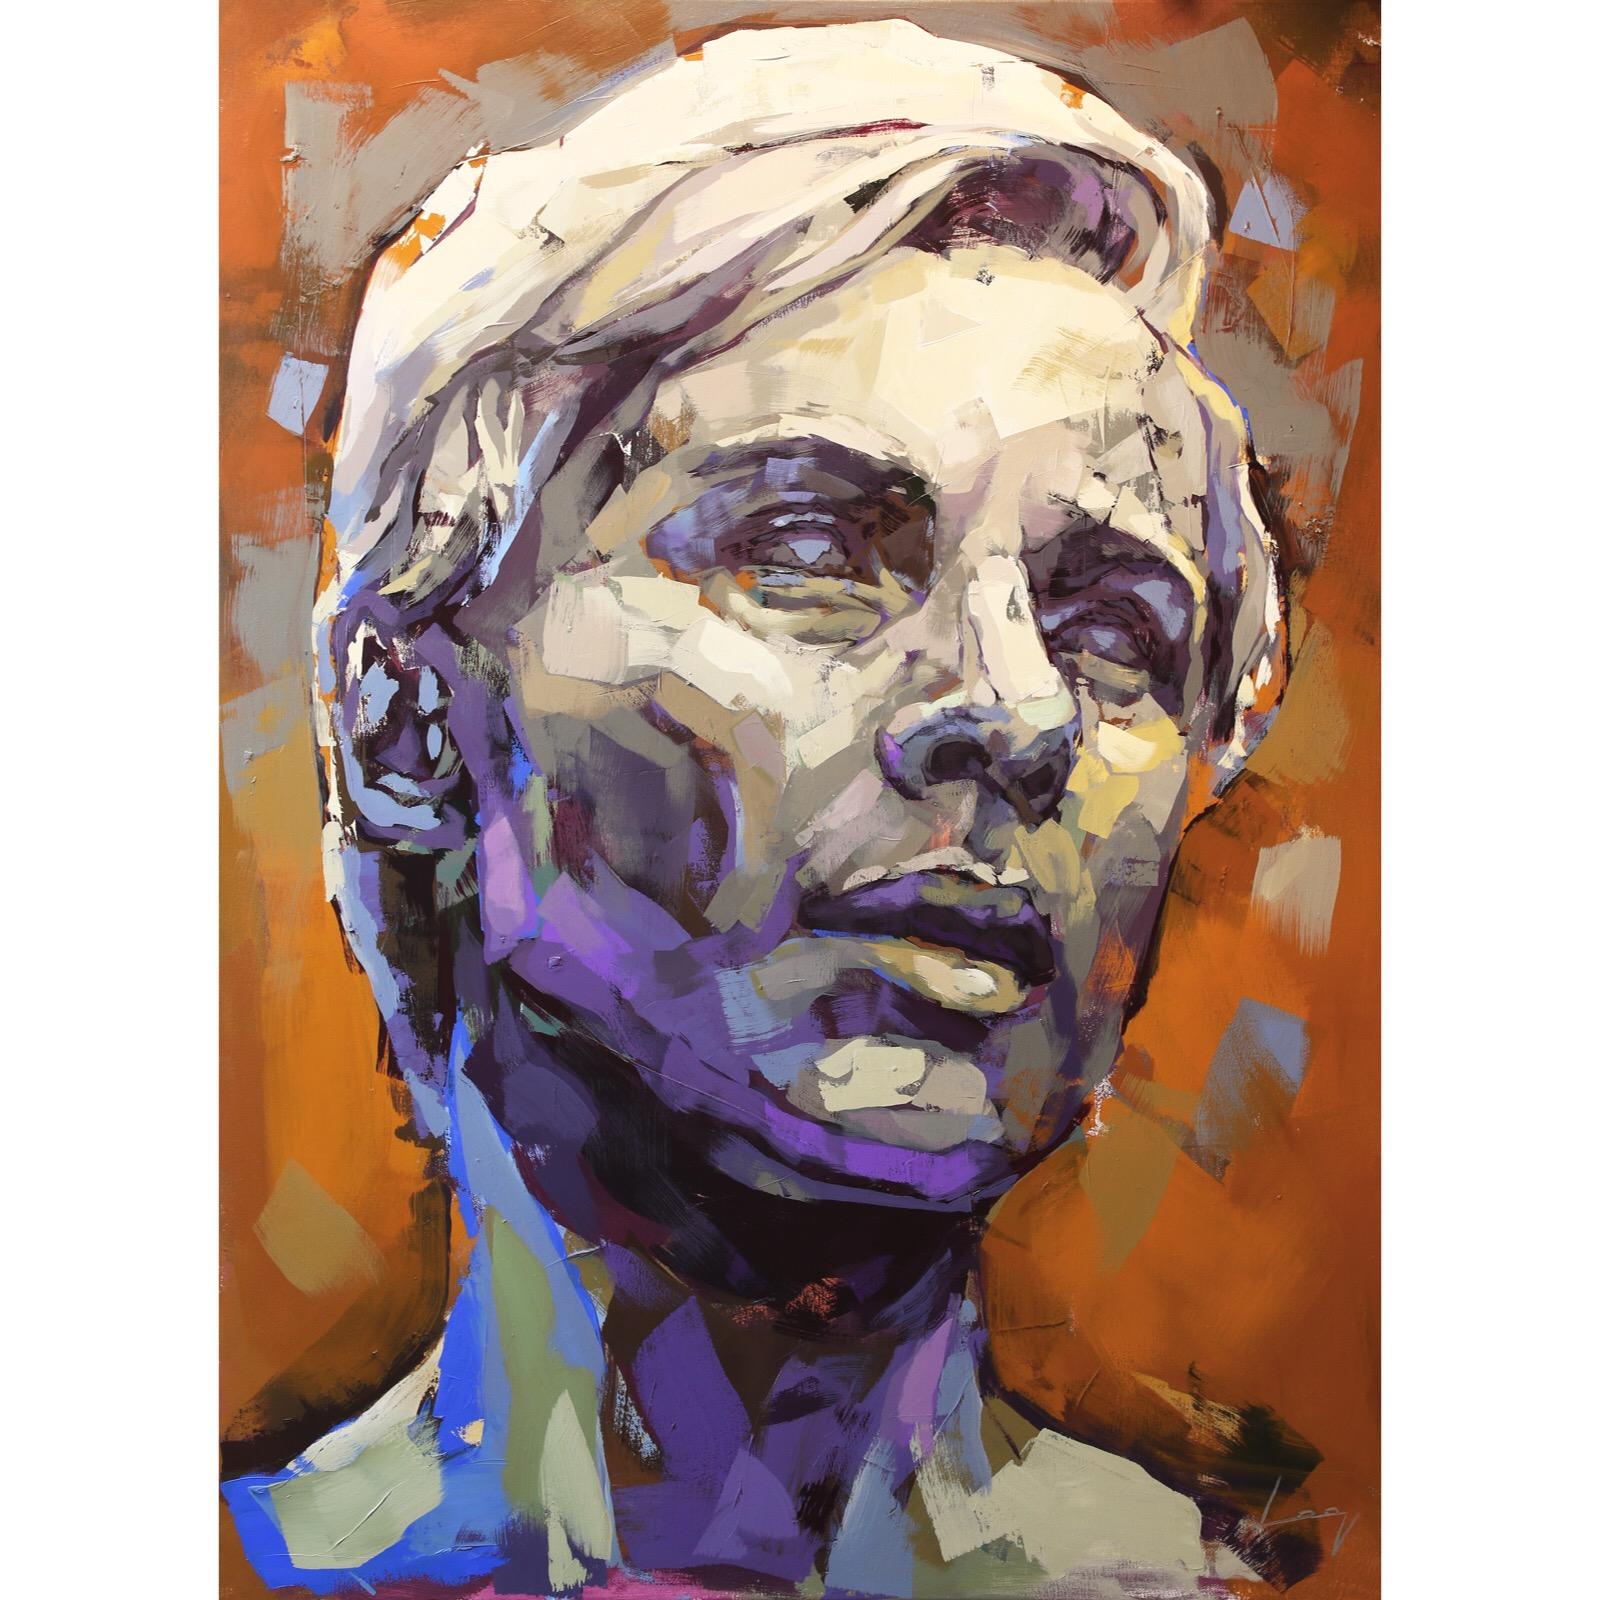 Bibi Andersson (Persona) 150x110 cm by Alberto Ramirez LEG (Bergman)